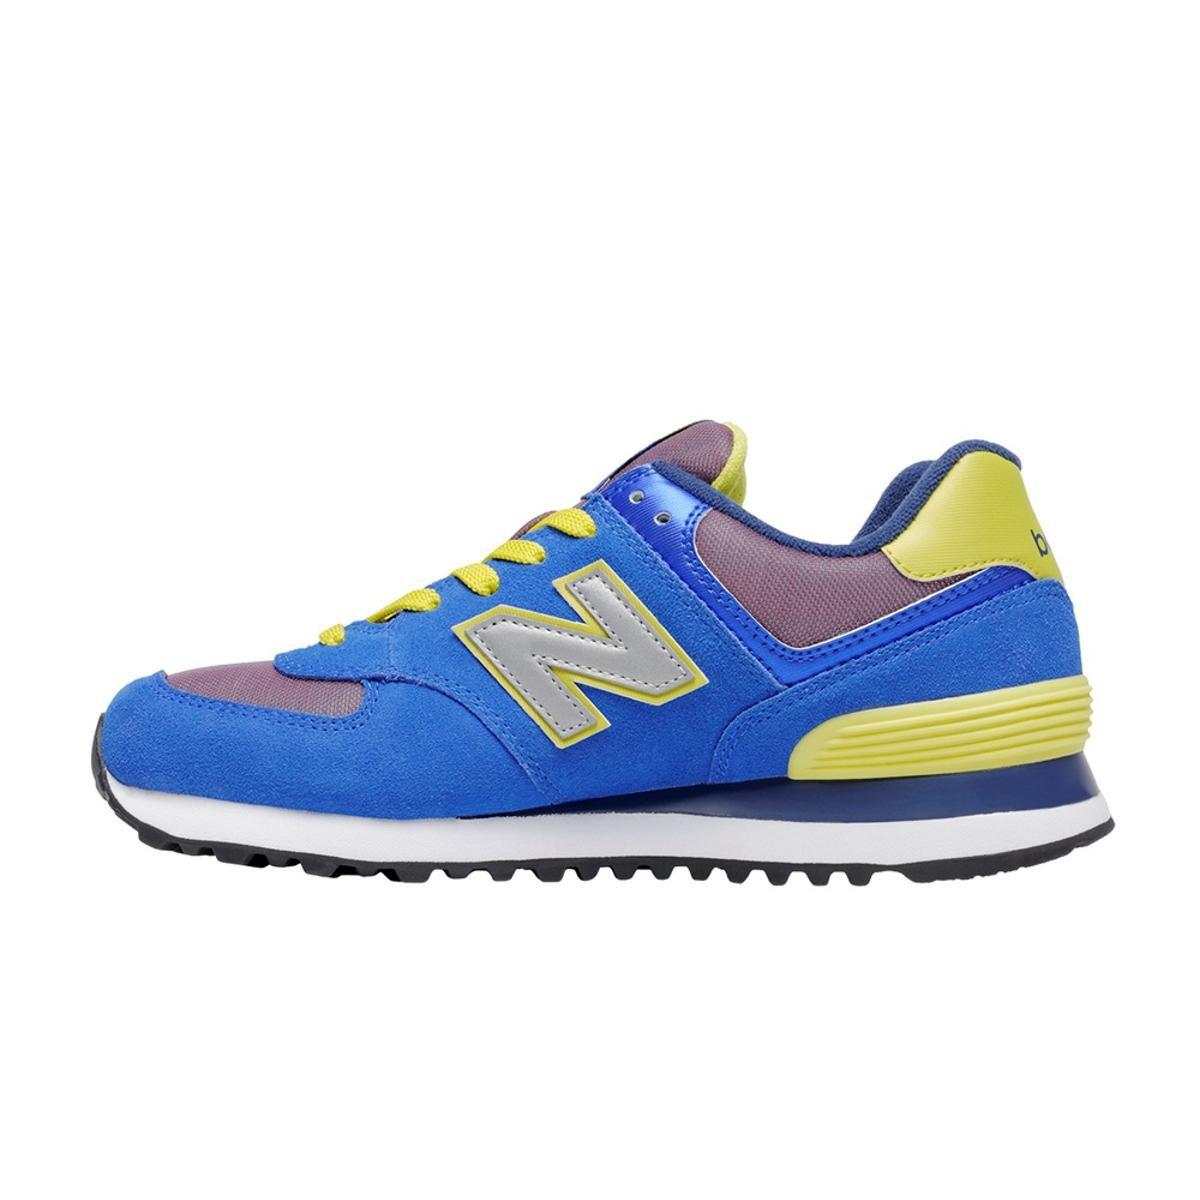 Tênis New Balance 574 Tiki Feminino - Compre Agora   Zattini 1a6faf1b90